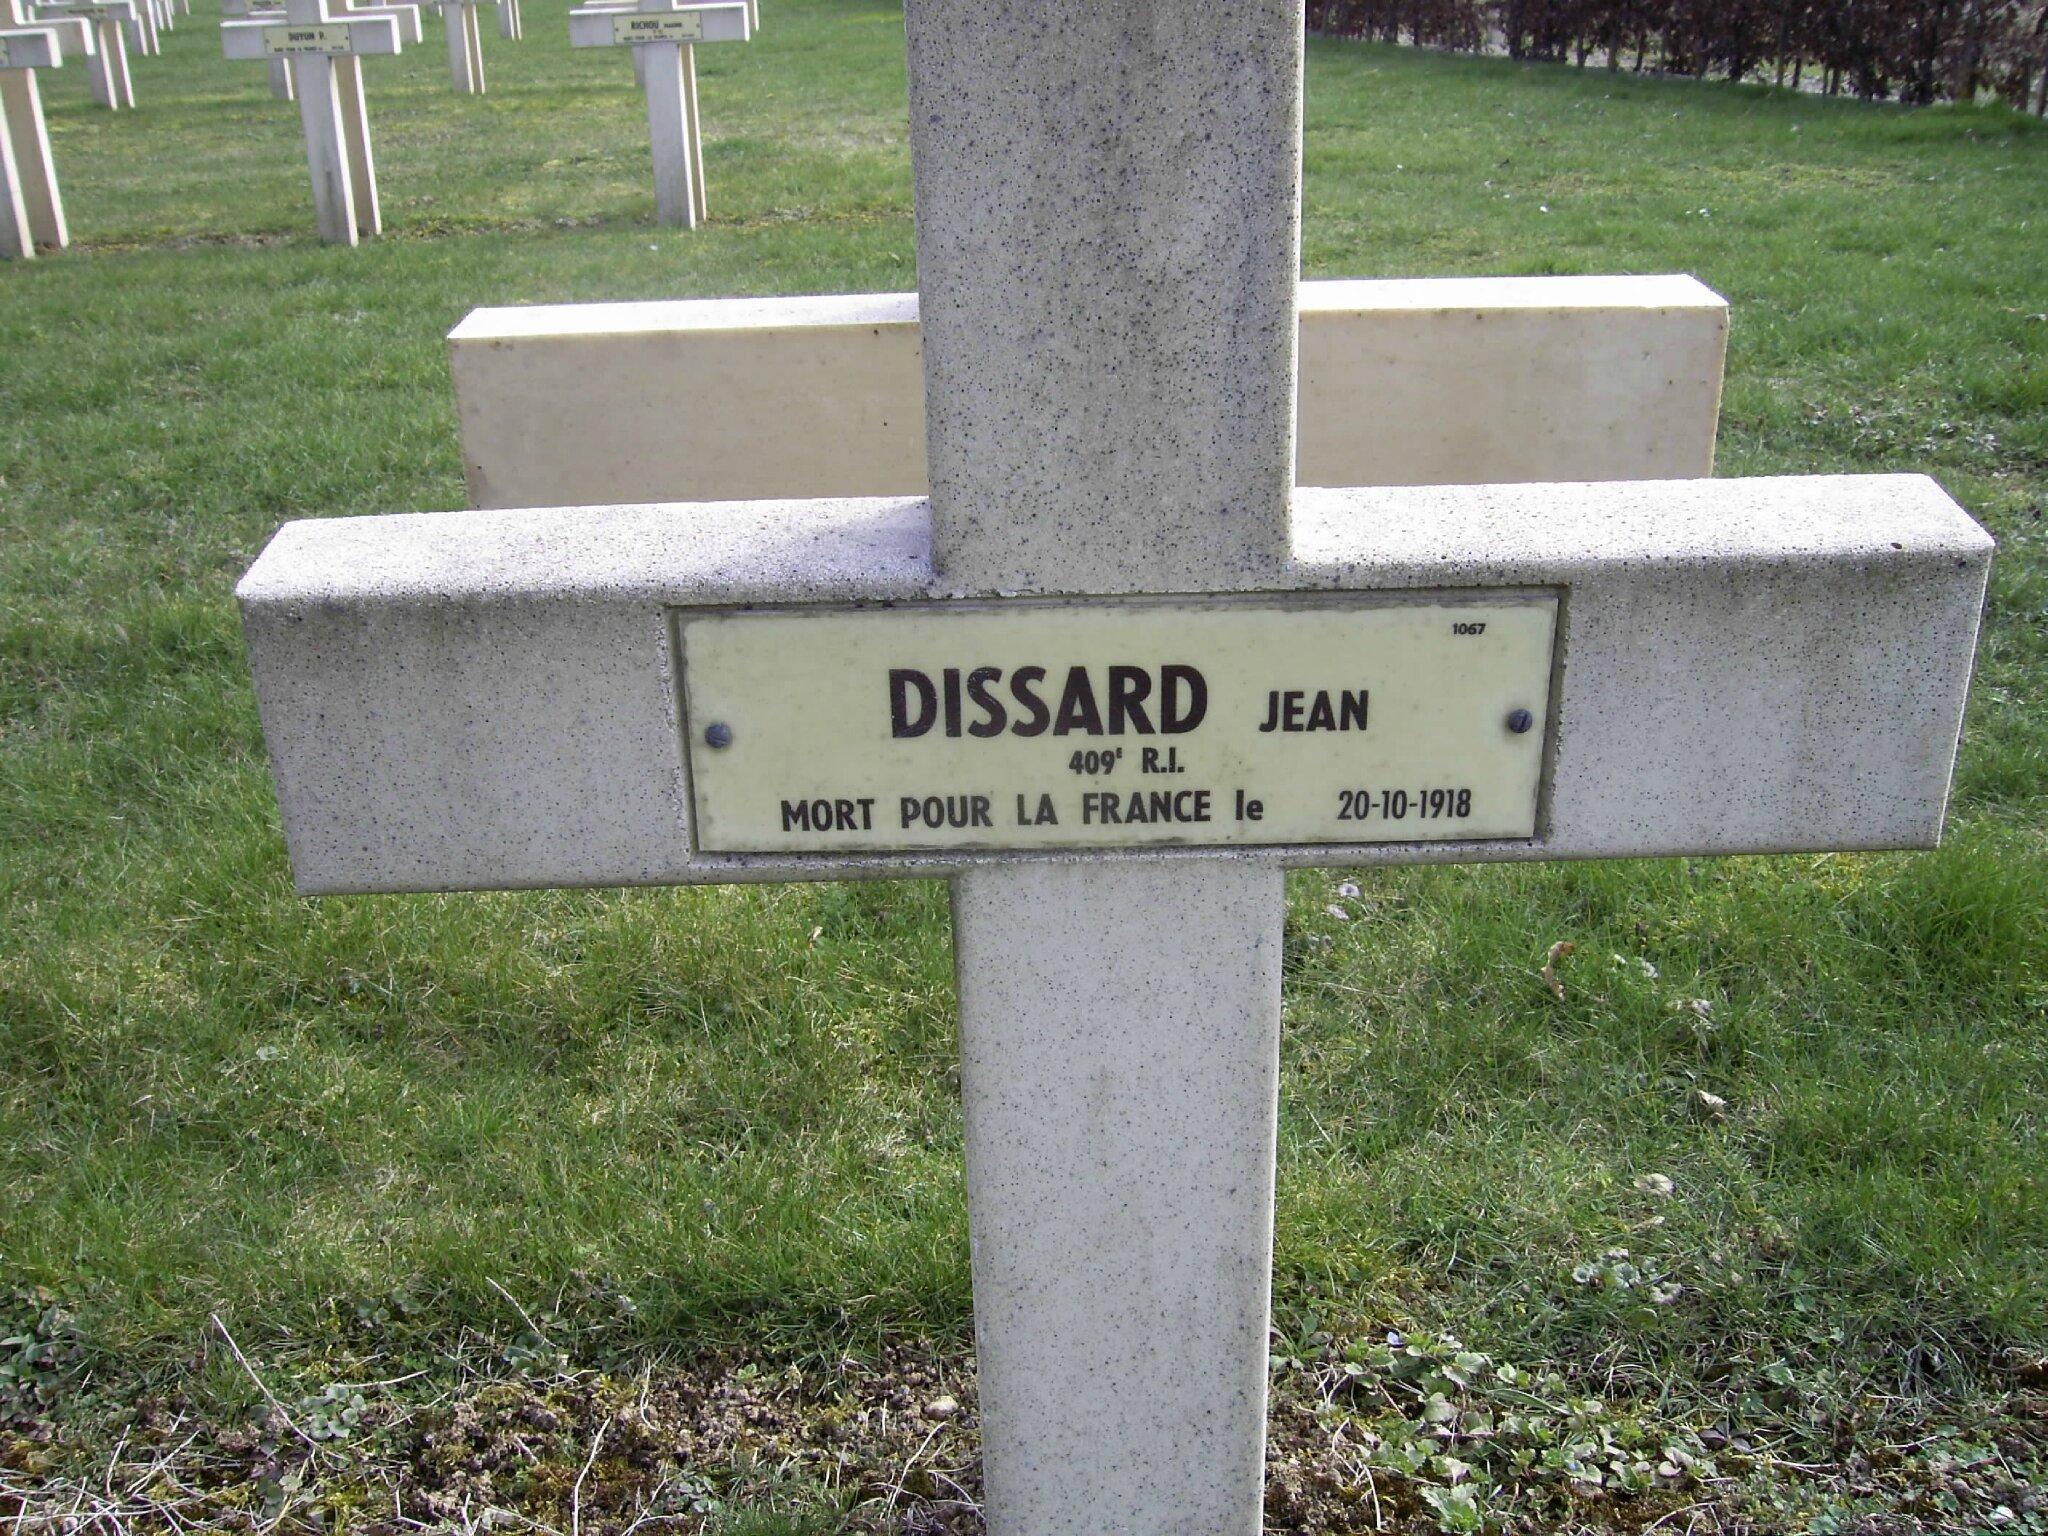 DISSARD Jean